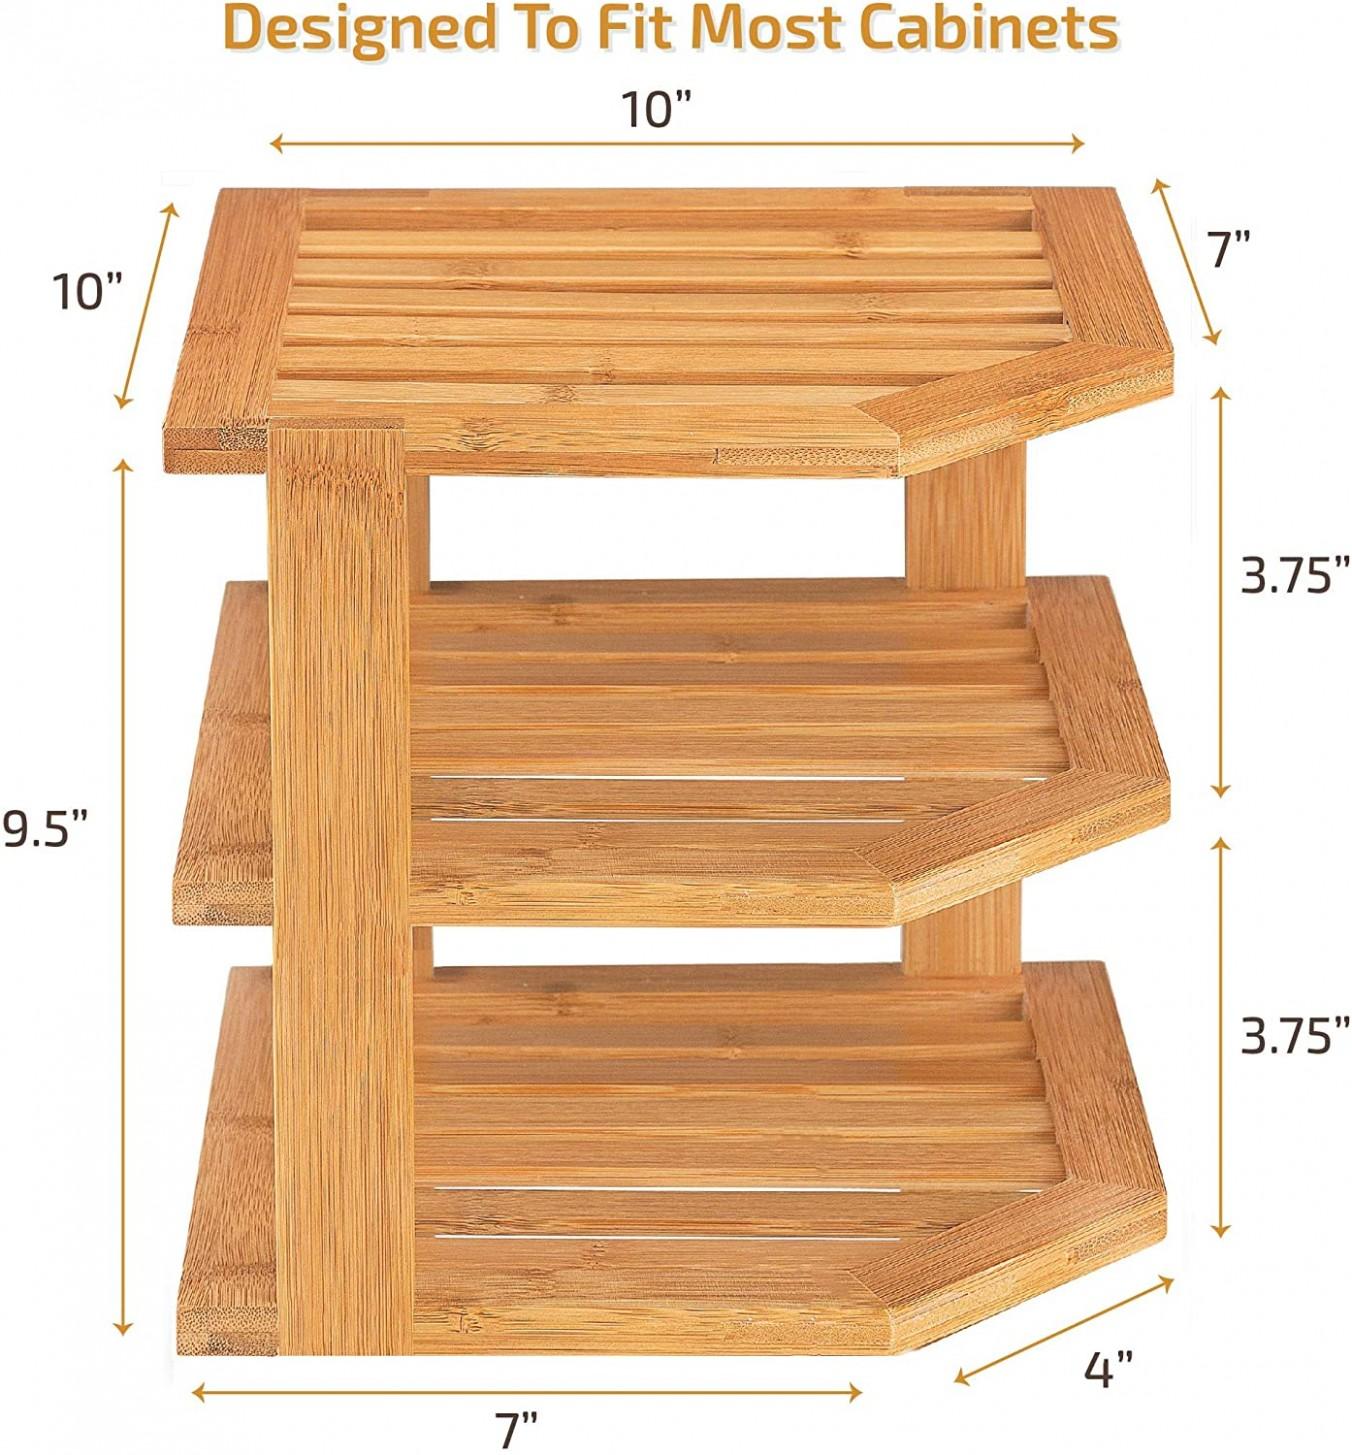 Bamboo Corner Shelf Storage Organizer - 9 Tier Kitchen Corner Rack for  Plates - Countertop, Cabinet & Pantry Organization - 26 X10